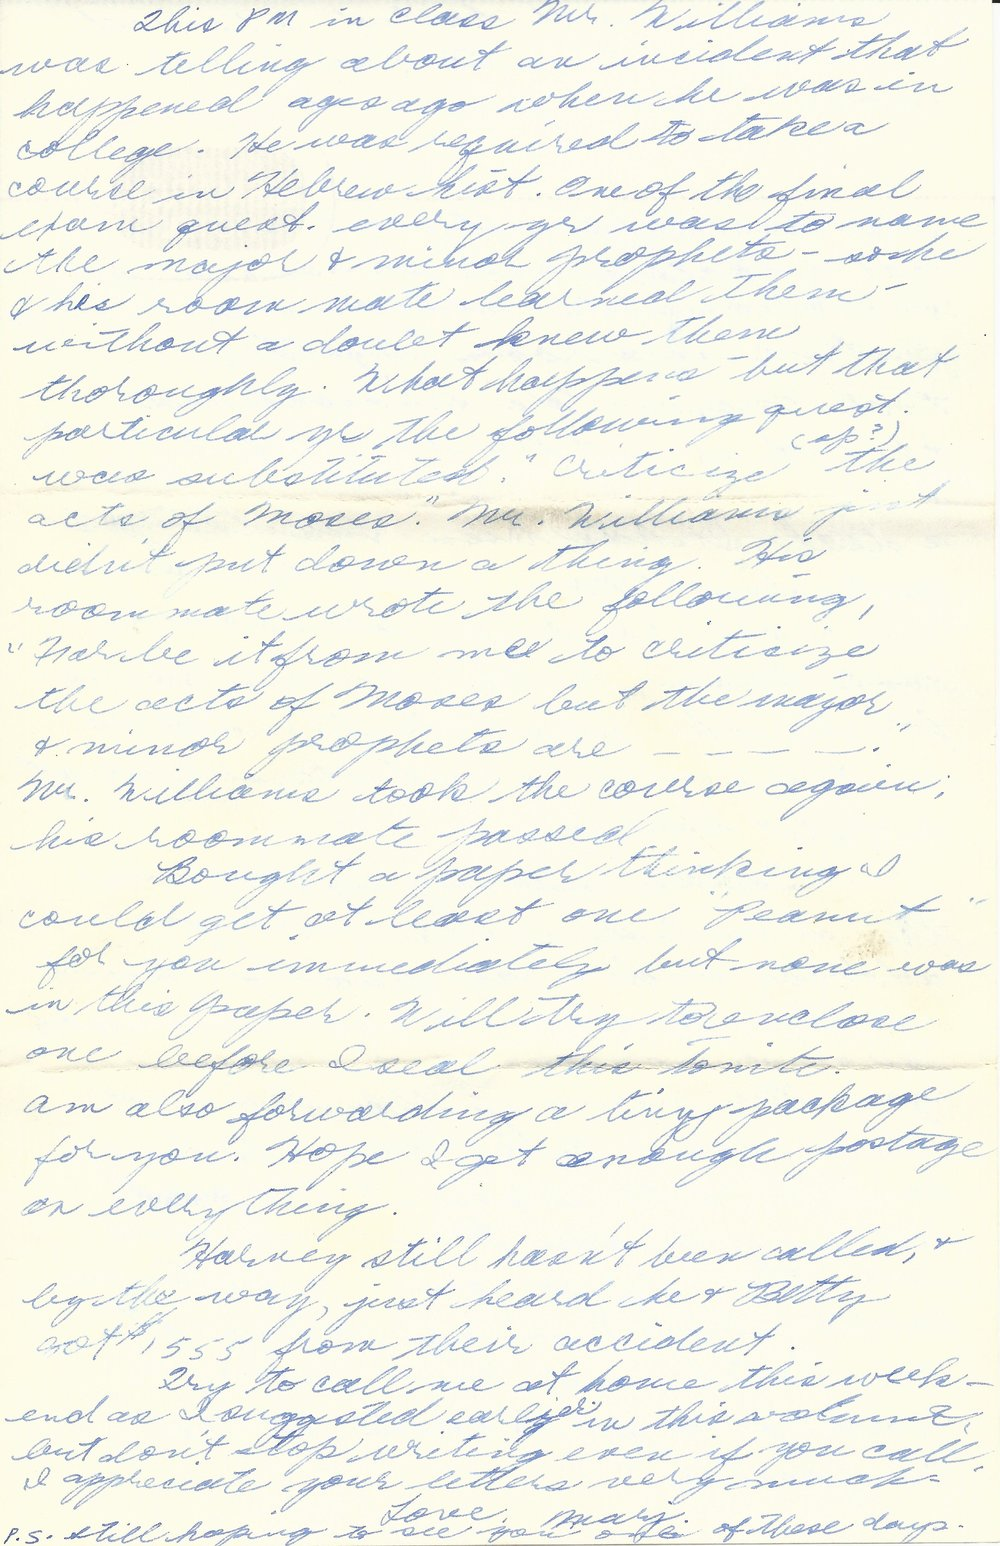 7. Oct. 9-21, 1952 (Oma)_Page_19.jpg